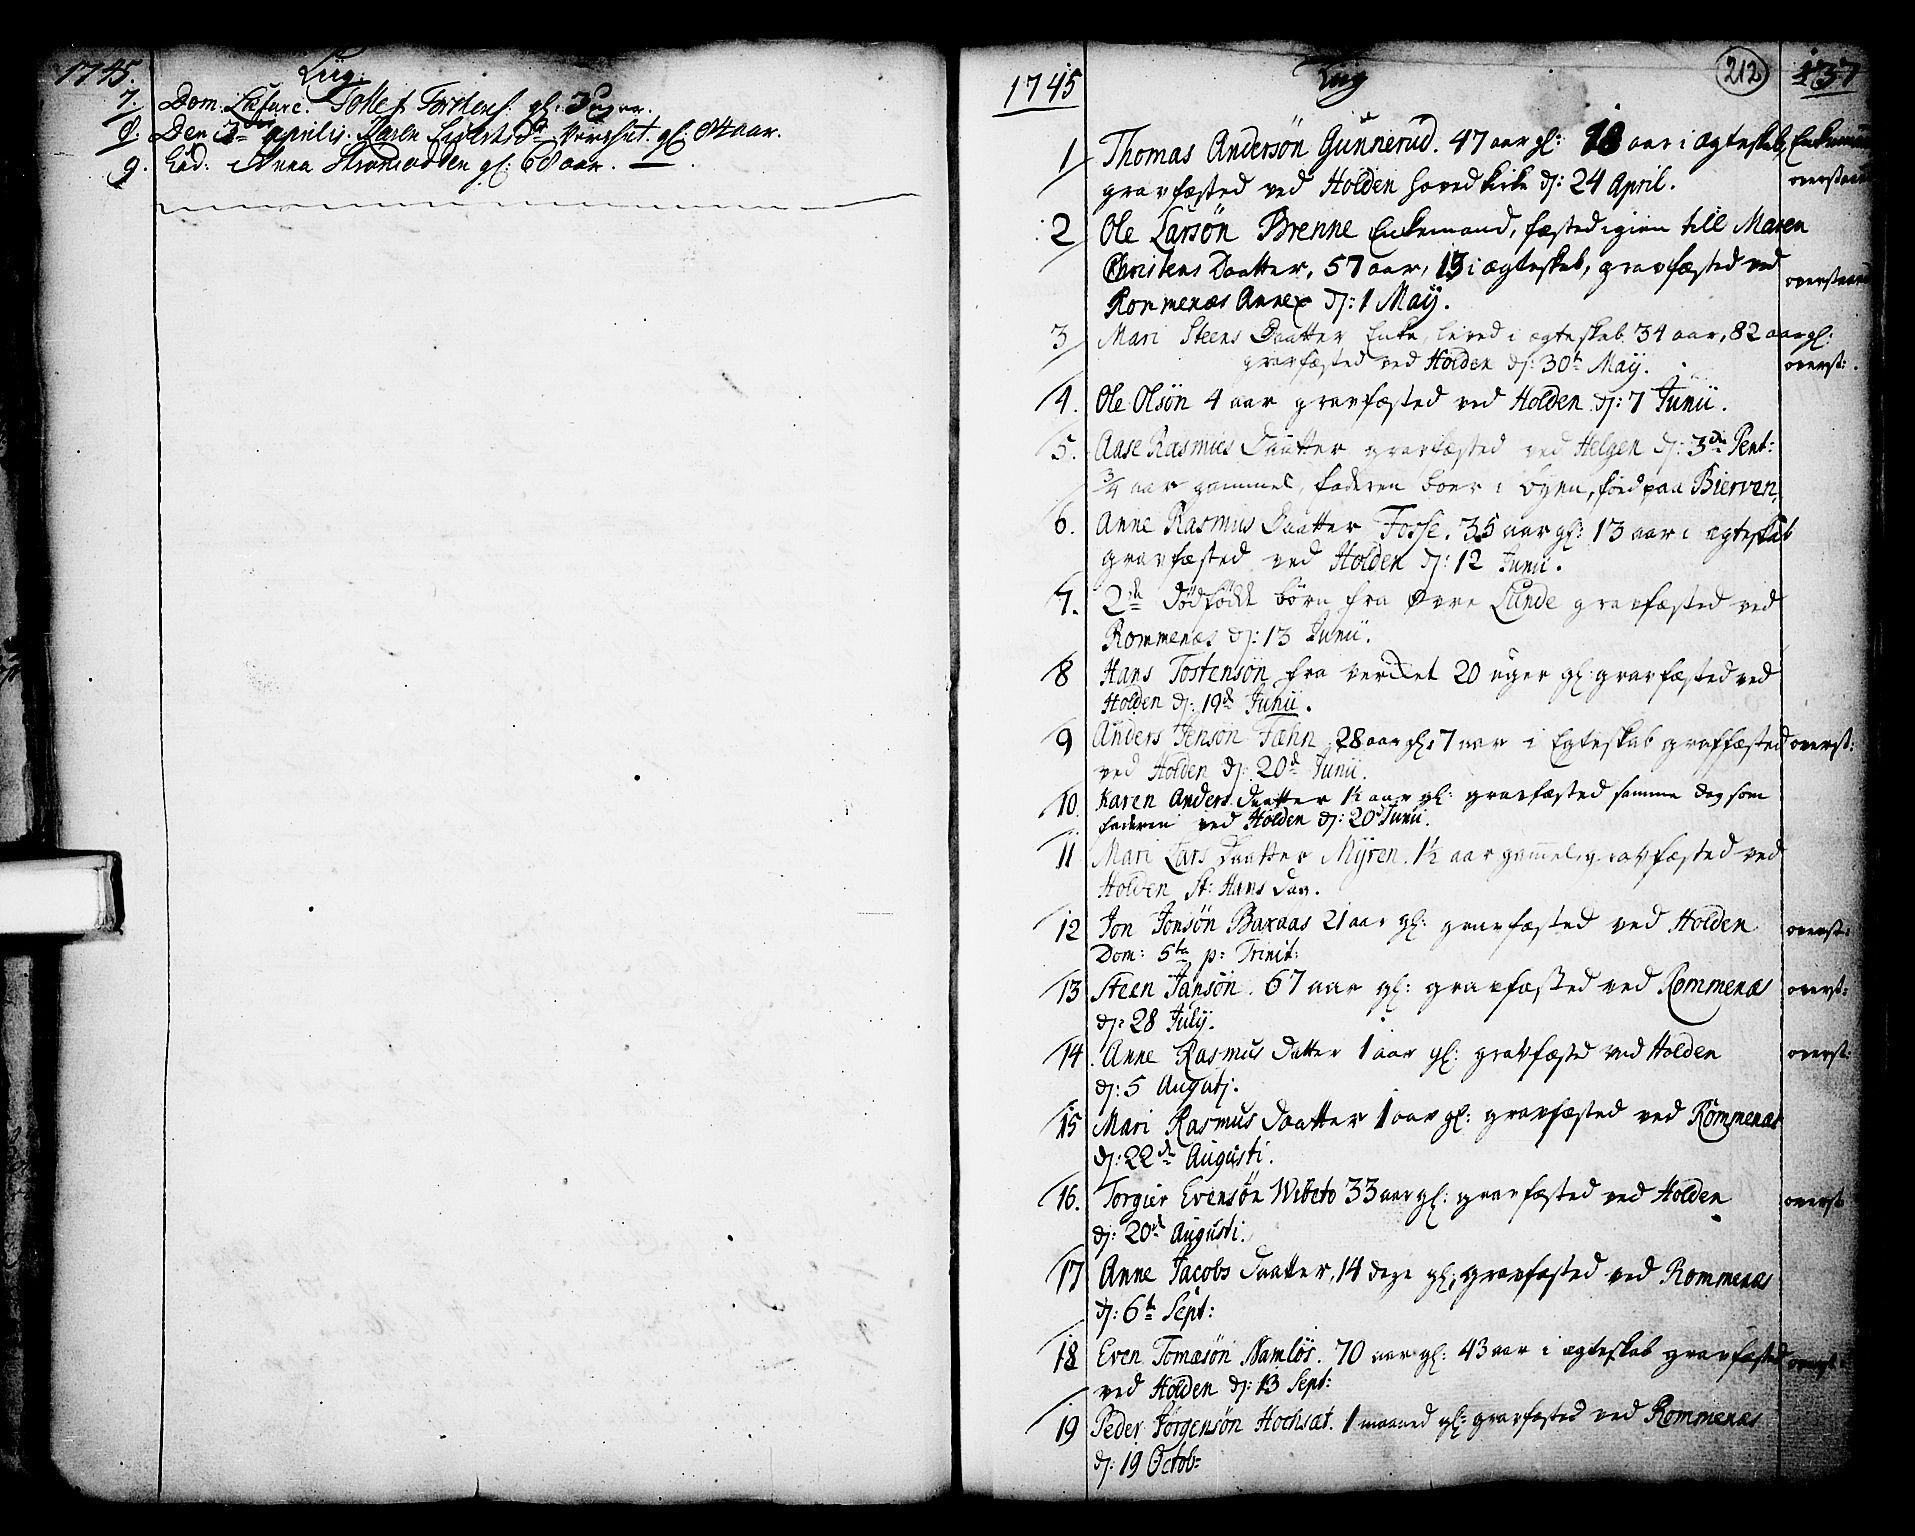 SAKO, Holla kirkebøker, F/Fa/L0001: Ministerialbok nr. 1, 1717-1779, s. 212